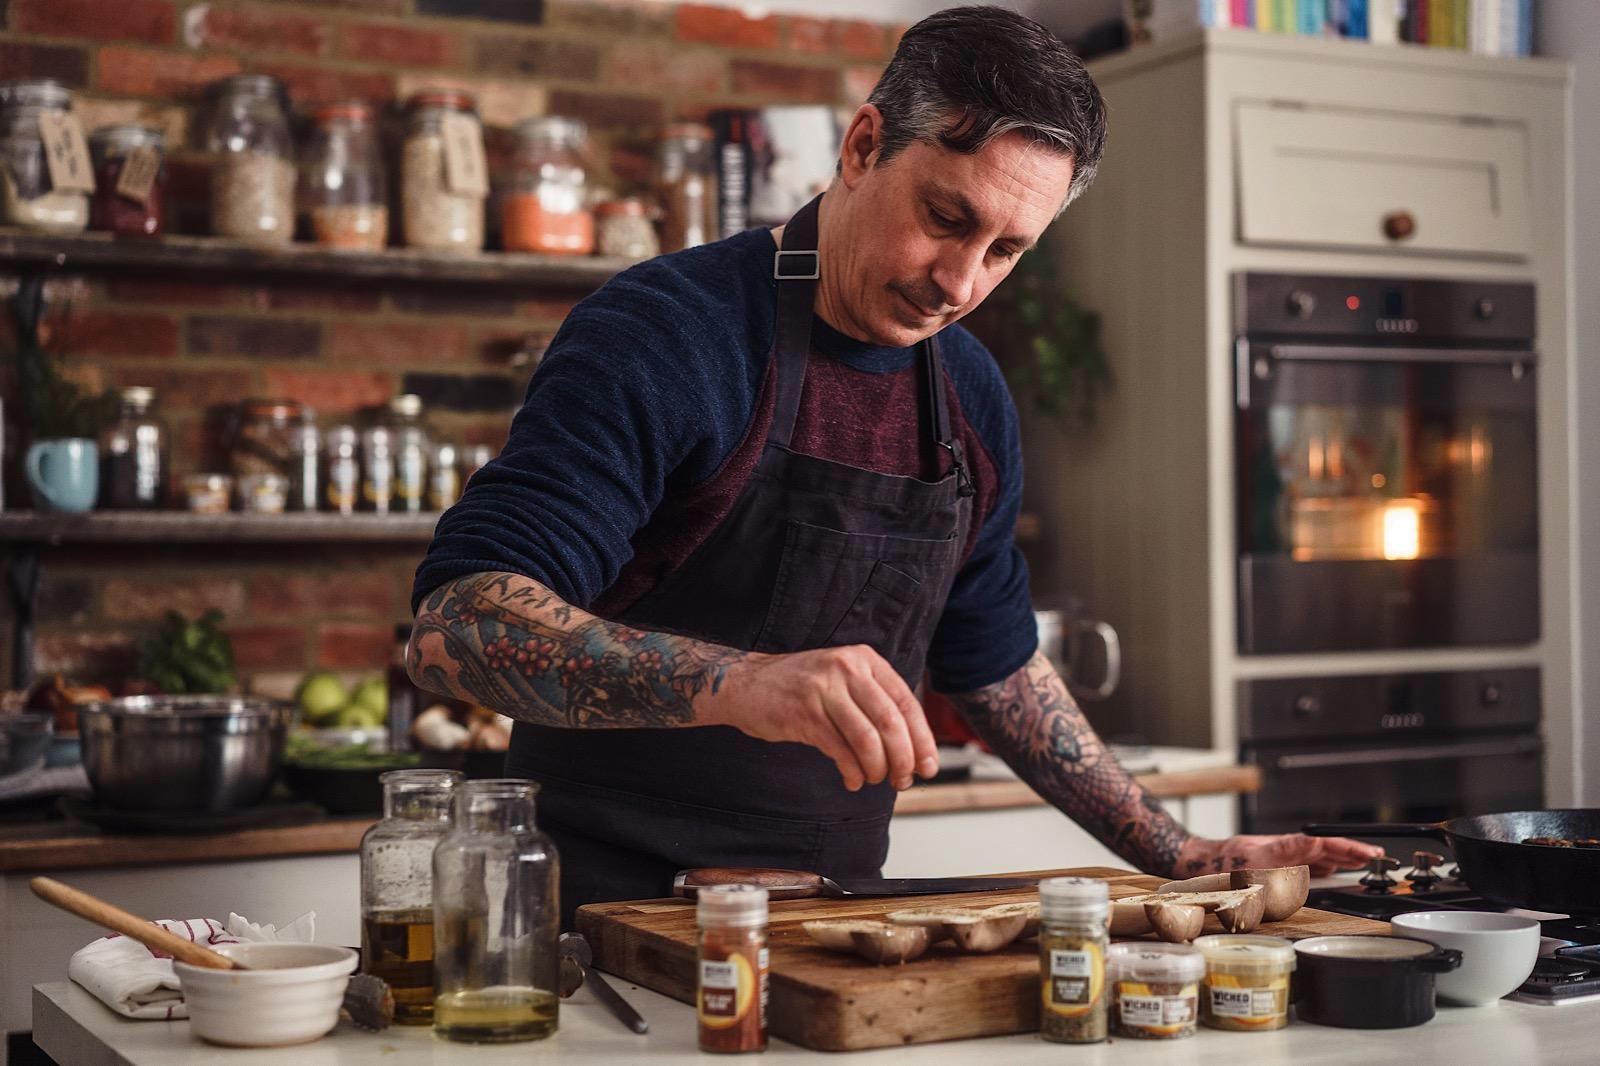 Chef Derek Sarno of Wicked Kitchen seasoning mushrooms during London Food Photography shoot for Tescos